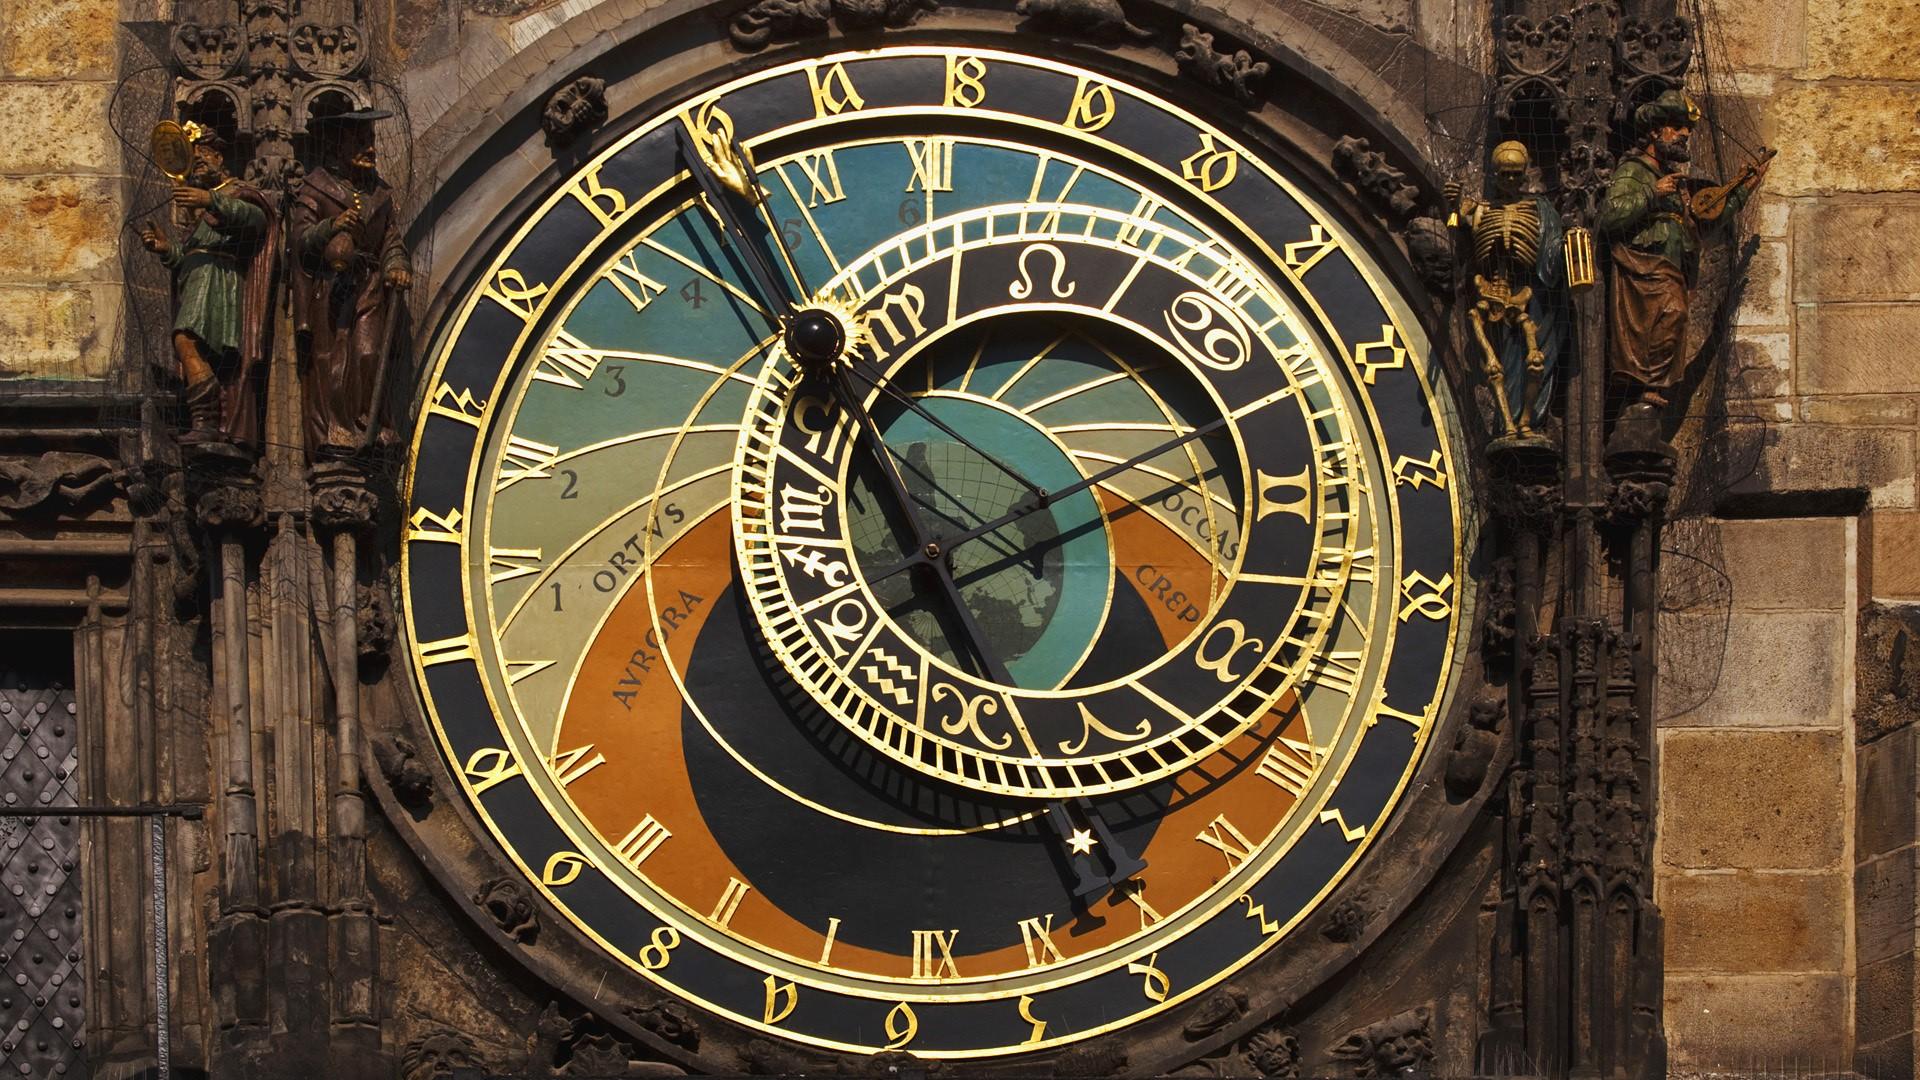 Wallpaper : architecture, wood, clockwork, clocks